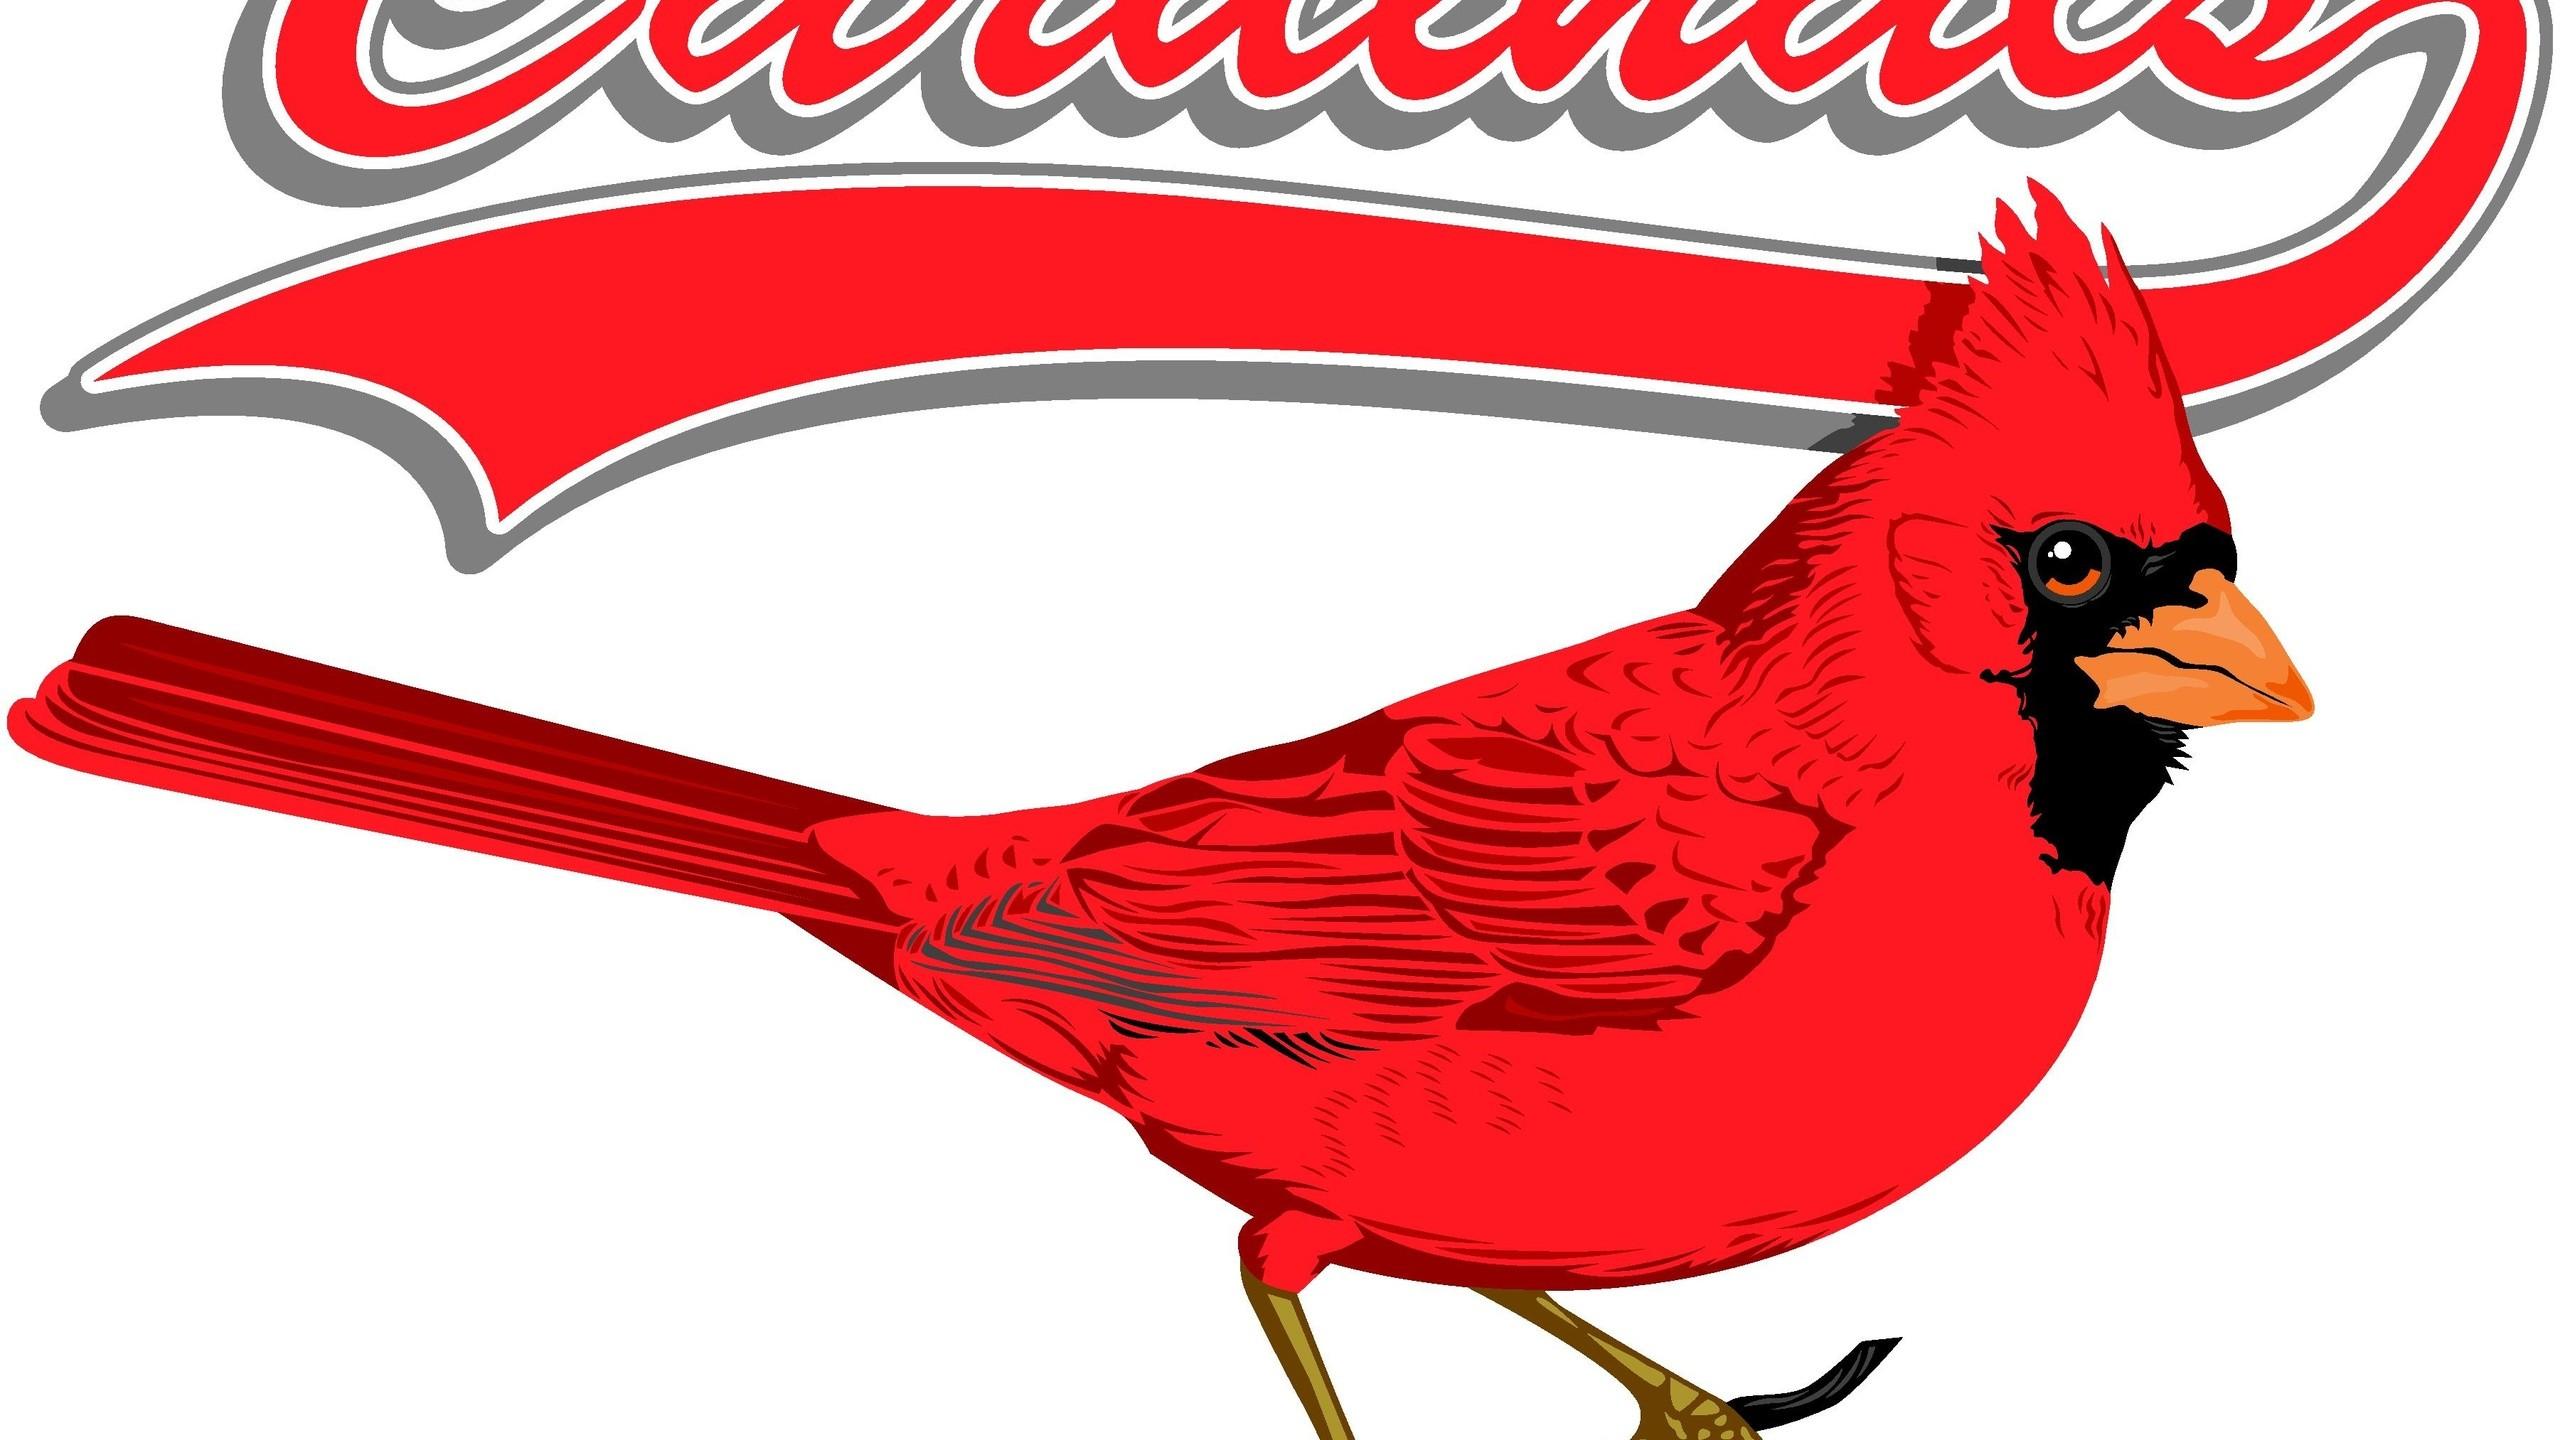 Sports, St. Louis Cardinals Baseball Mlb Logo Background, Mlb, St. Louis